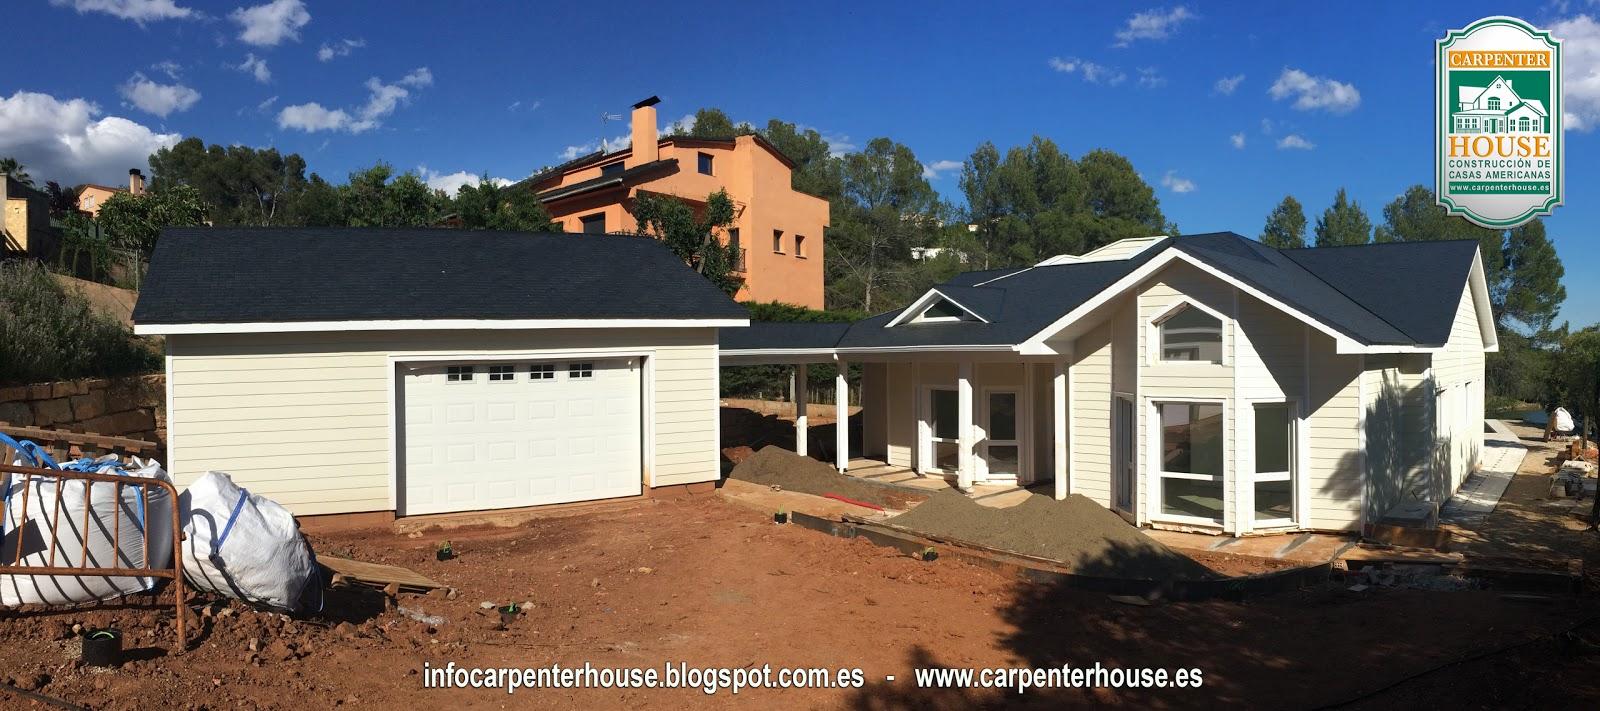 Carpenter house 6 fase construcci n casa en el vall s - Casas en valles occidental ...